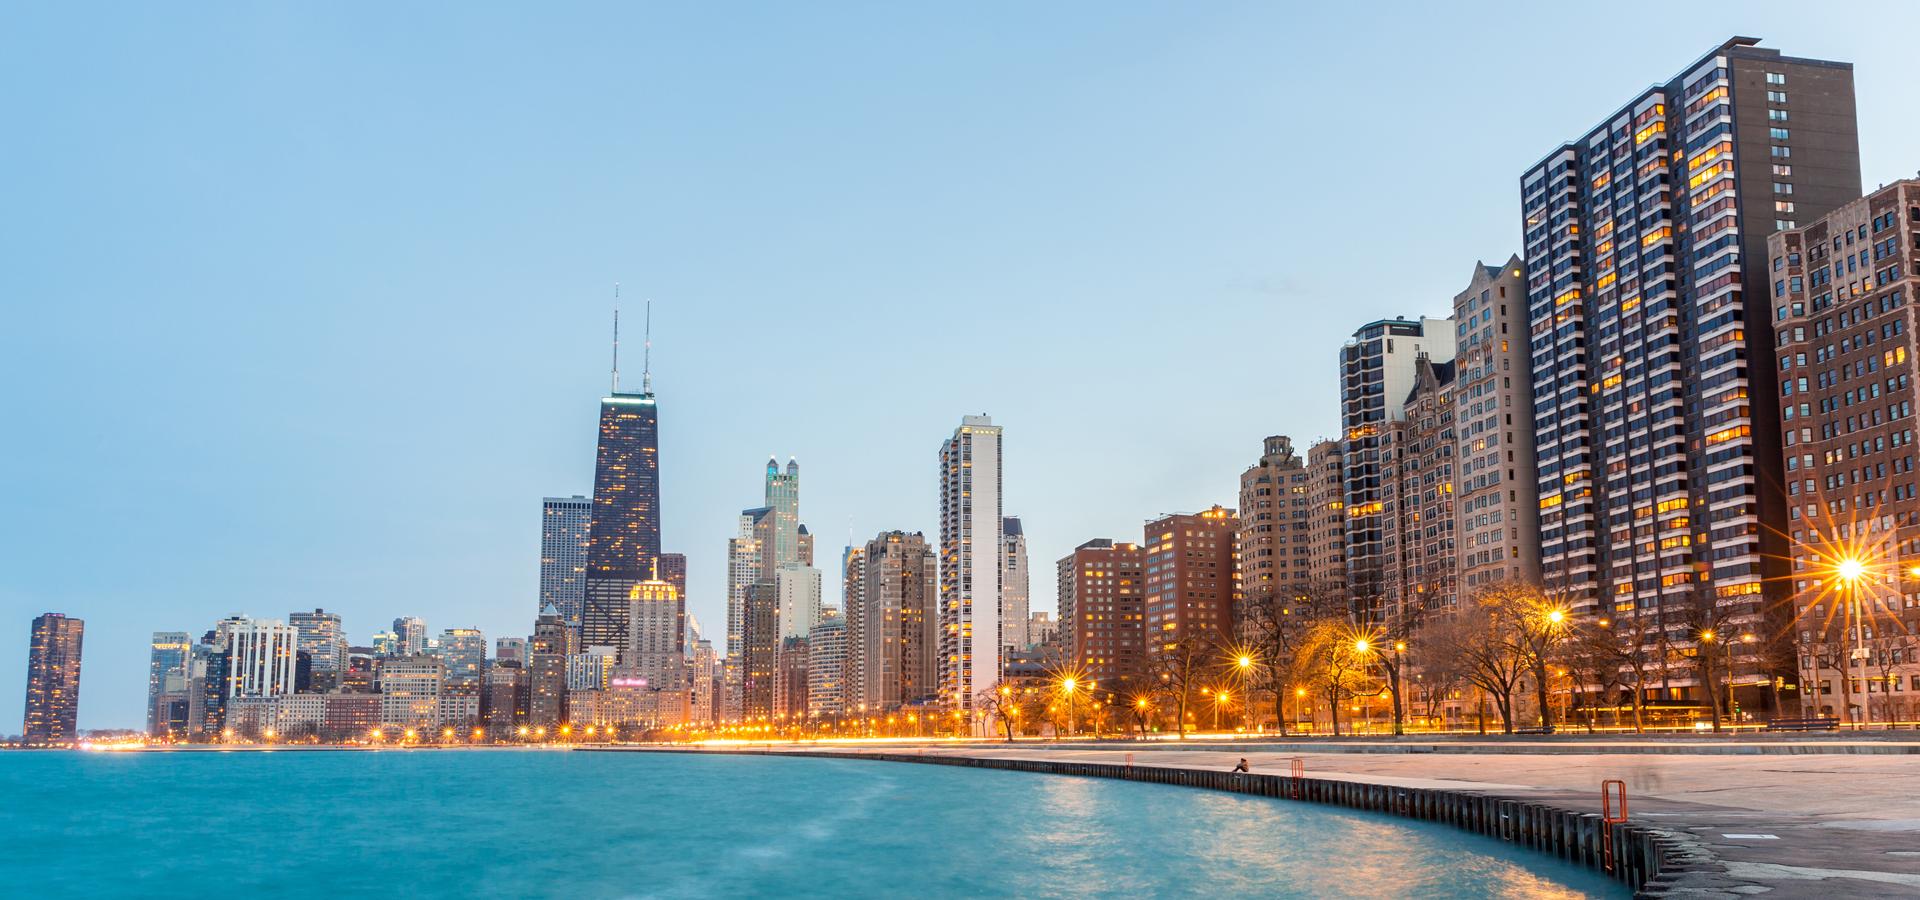 Peer-to-peer advisory in Chicago, Illinois, USA